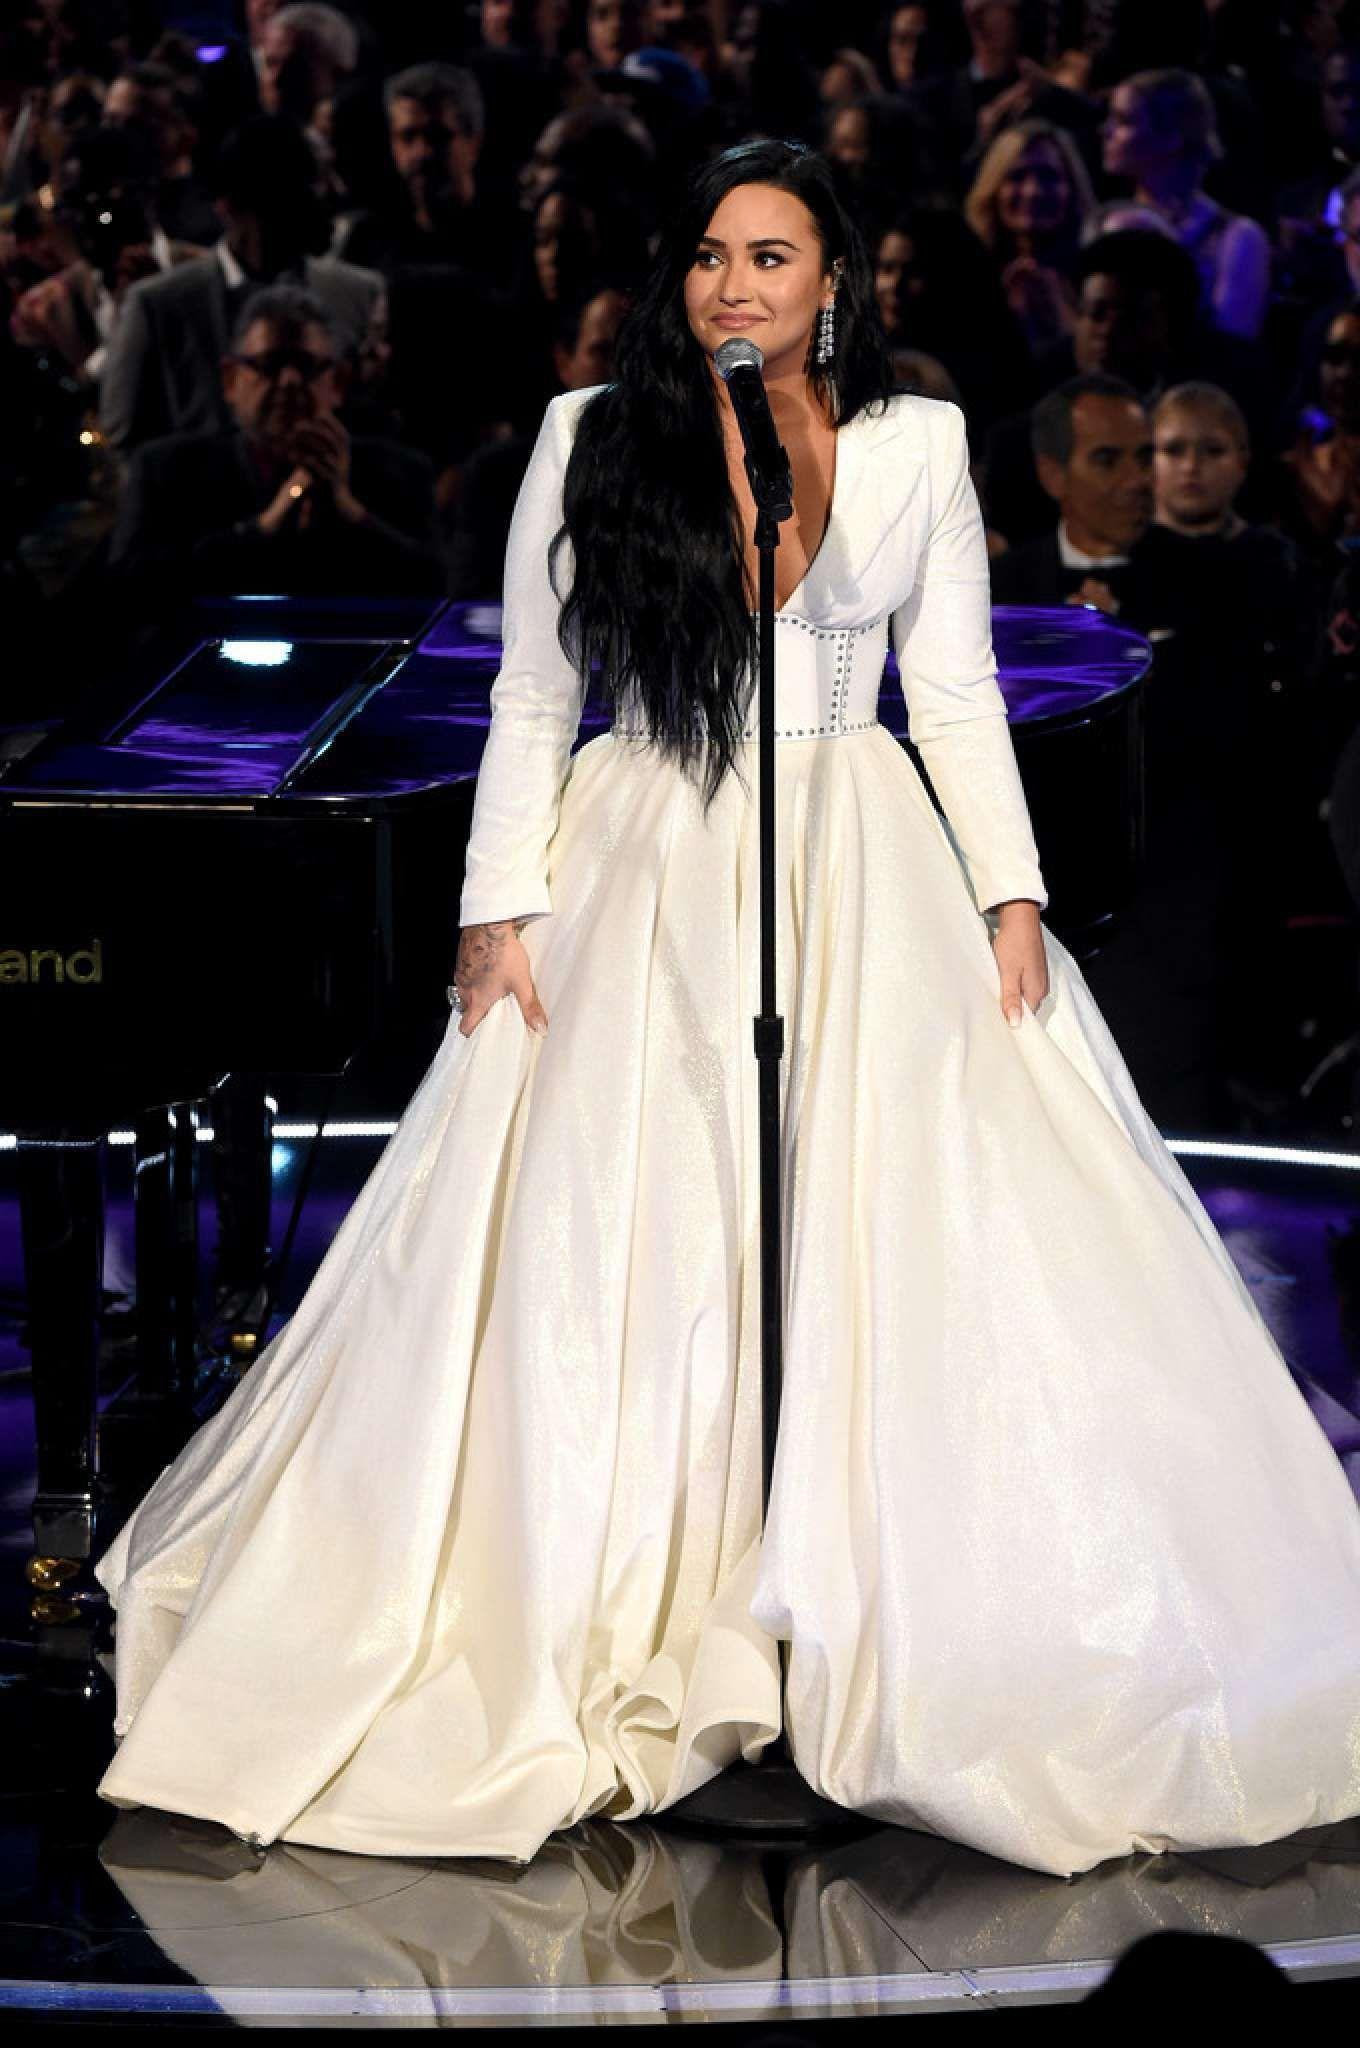 Demi Lovato White Maxi Dress Autumn Winter 2020 On Sassy Daily In 2020 Maxi Dresses Fall White Maxi Dresses Fall Dresses